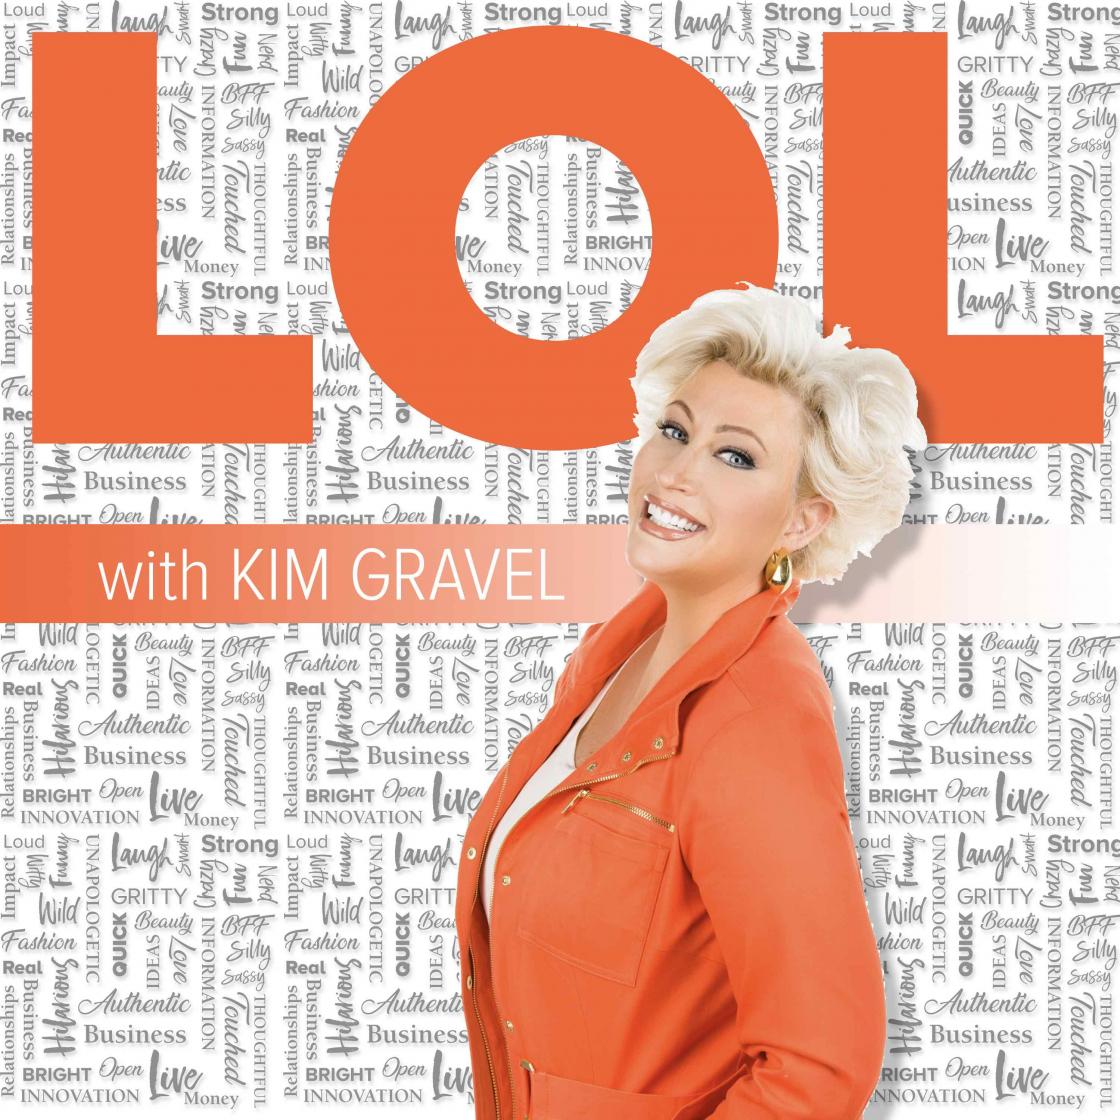 LOL with Kim Gravel